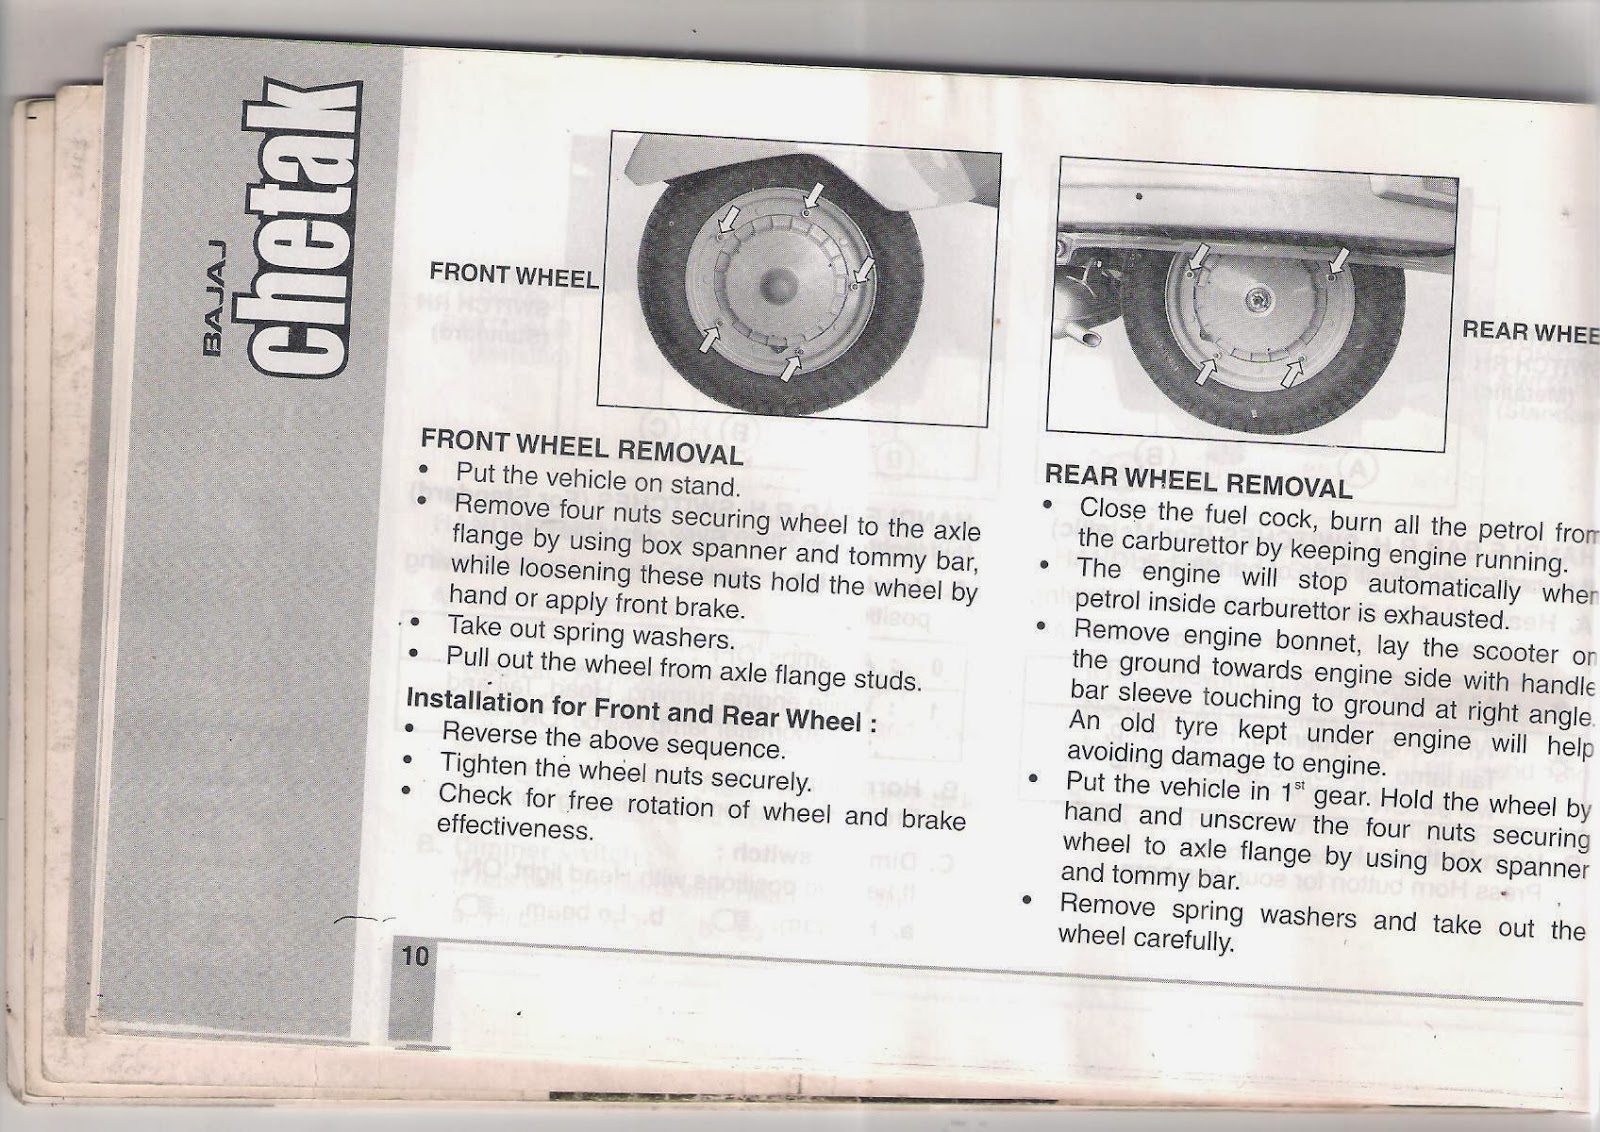 rare motorcycle bajaj chetak 2005 model owners manual. Black Bedroom Furniture Sets. Home Design Ideas